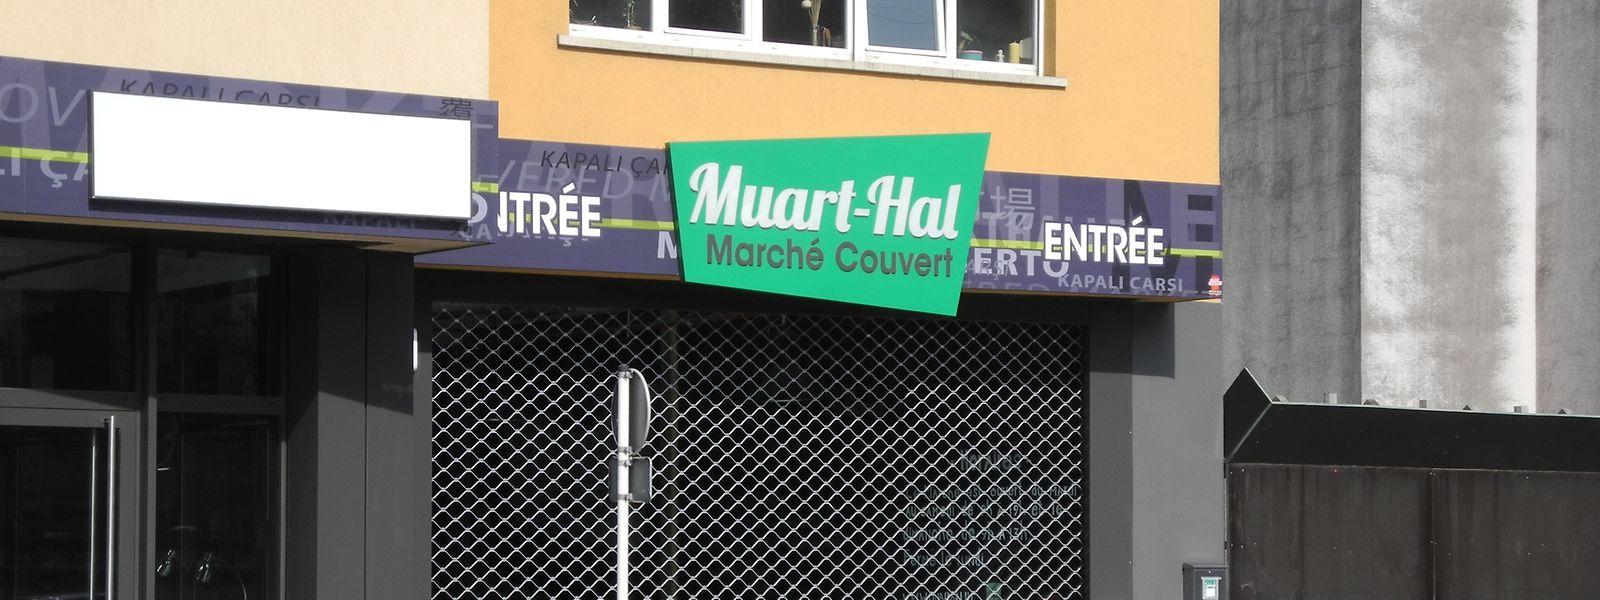 Am Mittwoch blieb die Muart-Hal in Esch/Alzette geschlossen.